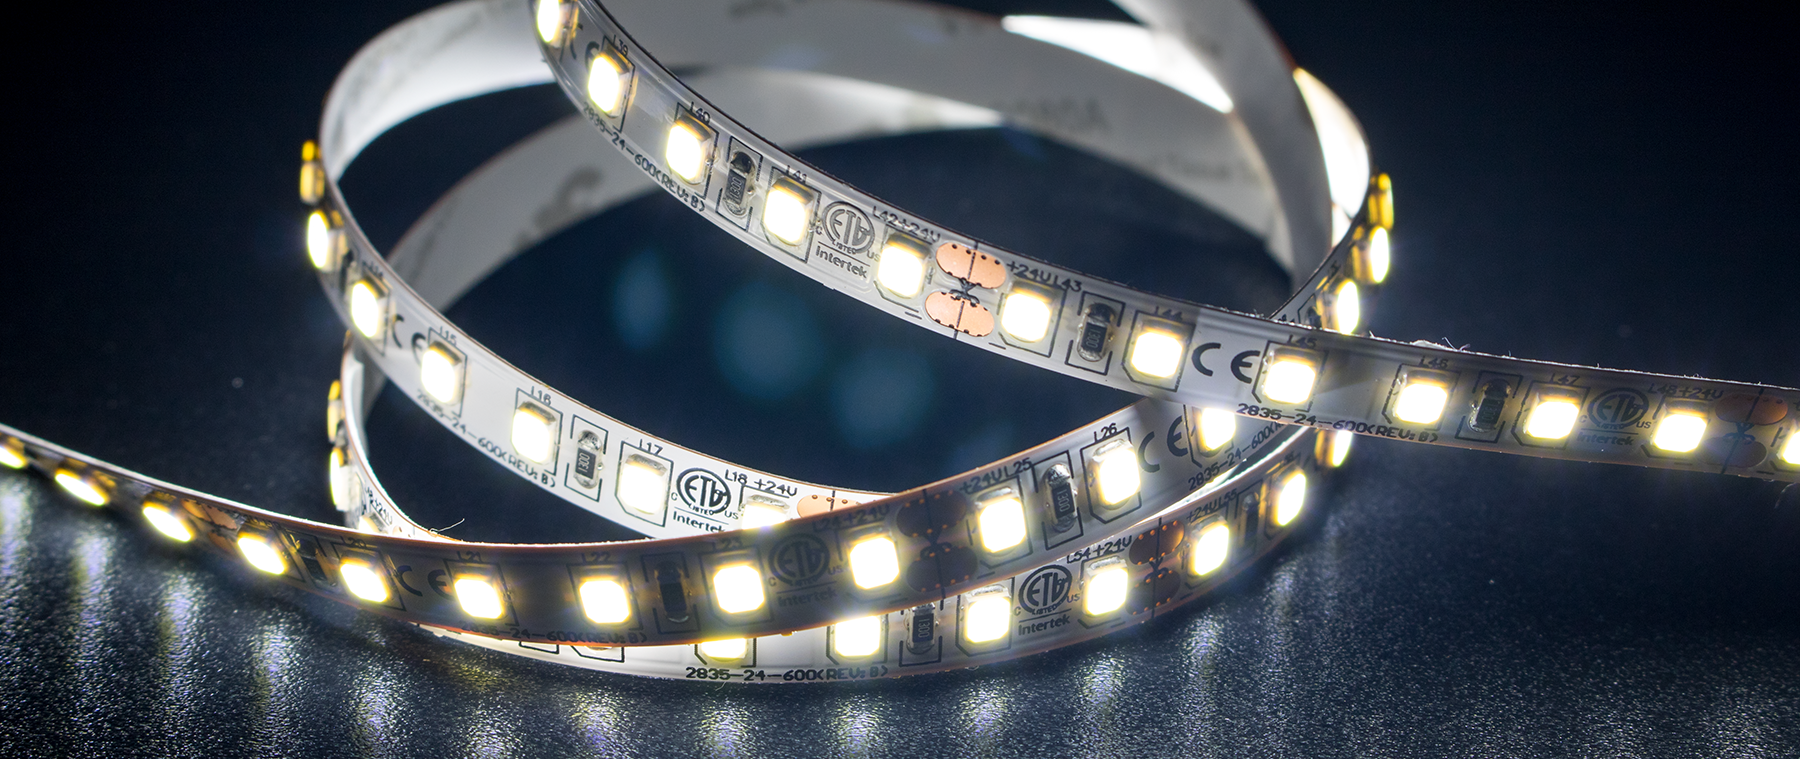 LED Strip Colour Consistency Simplified